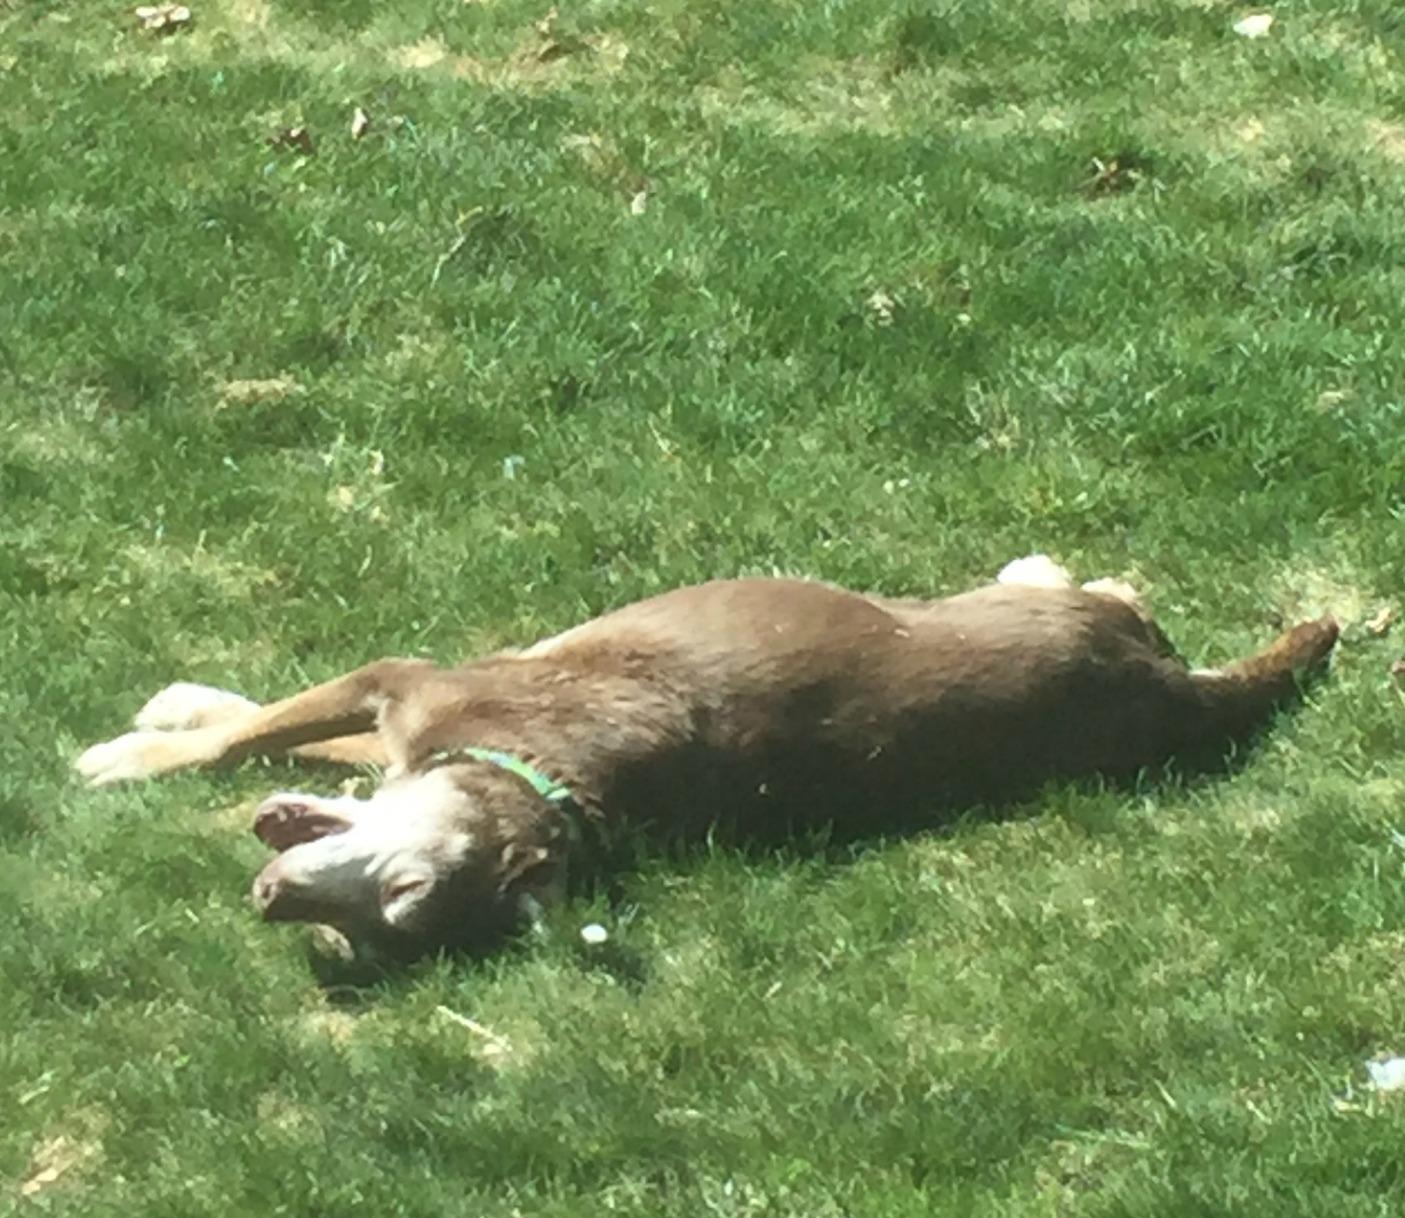 lilly sunbathing.jpeg